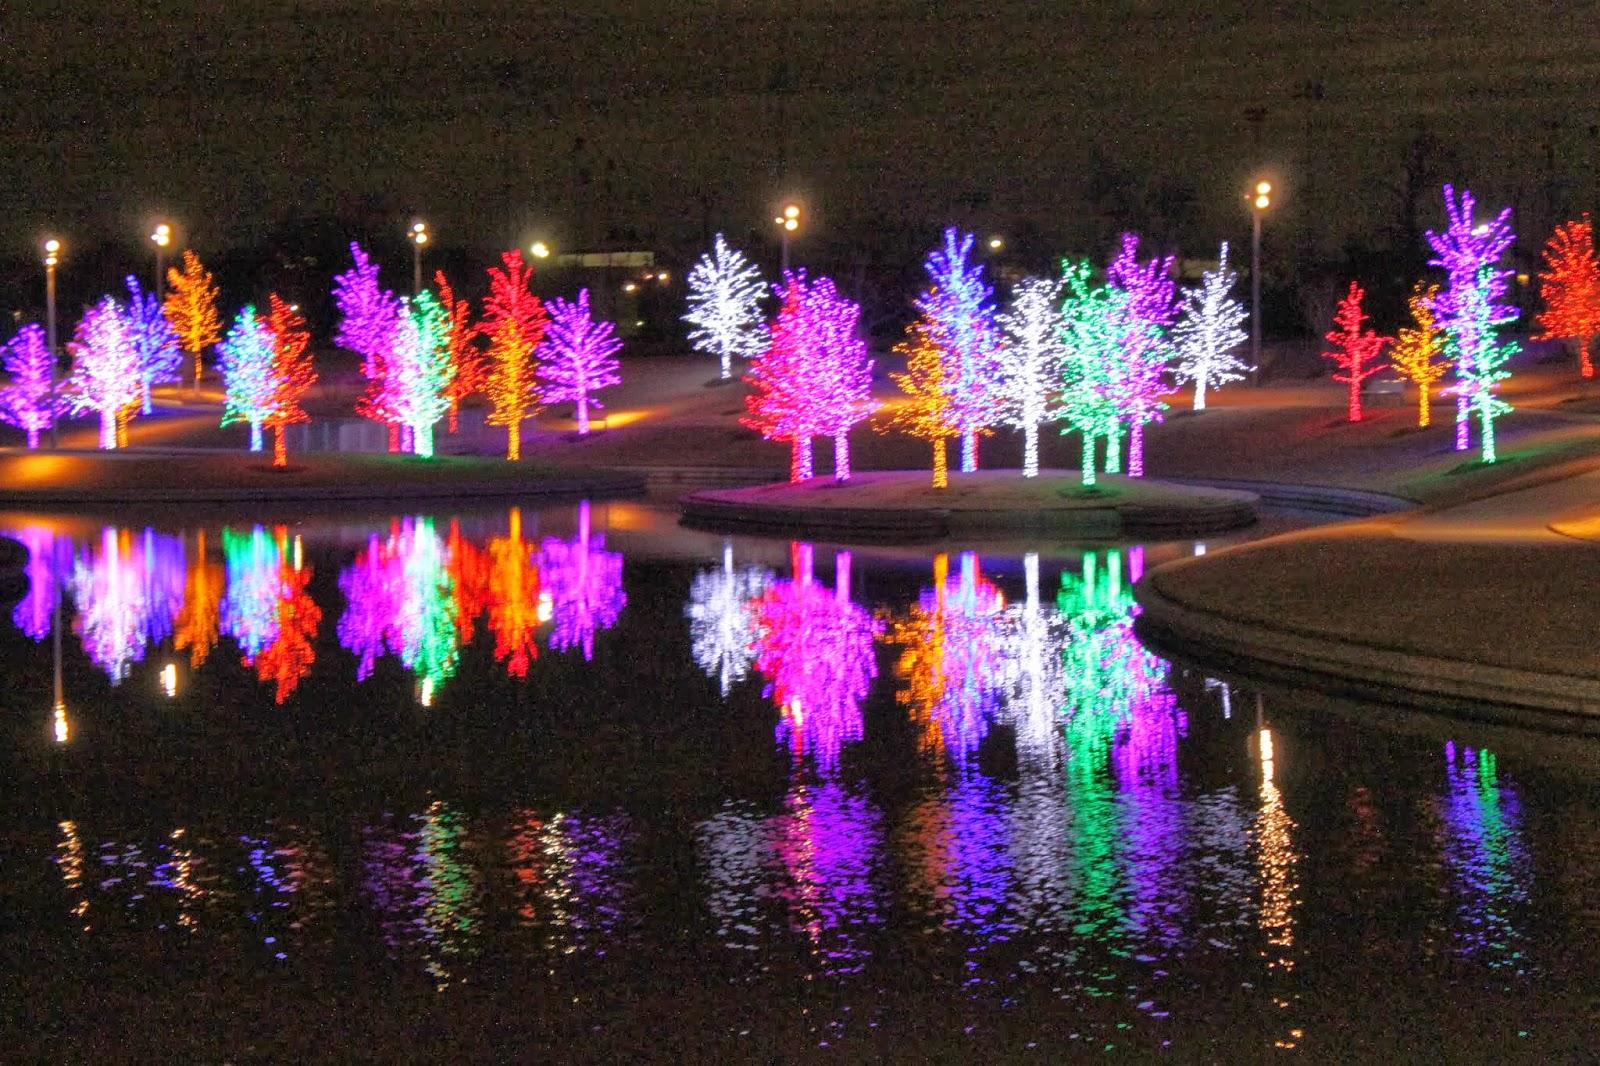 Nafisa S World Throwback Christmas Lights In Vitruvian Park